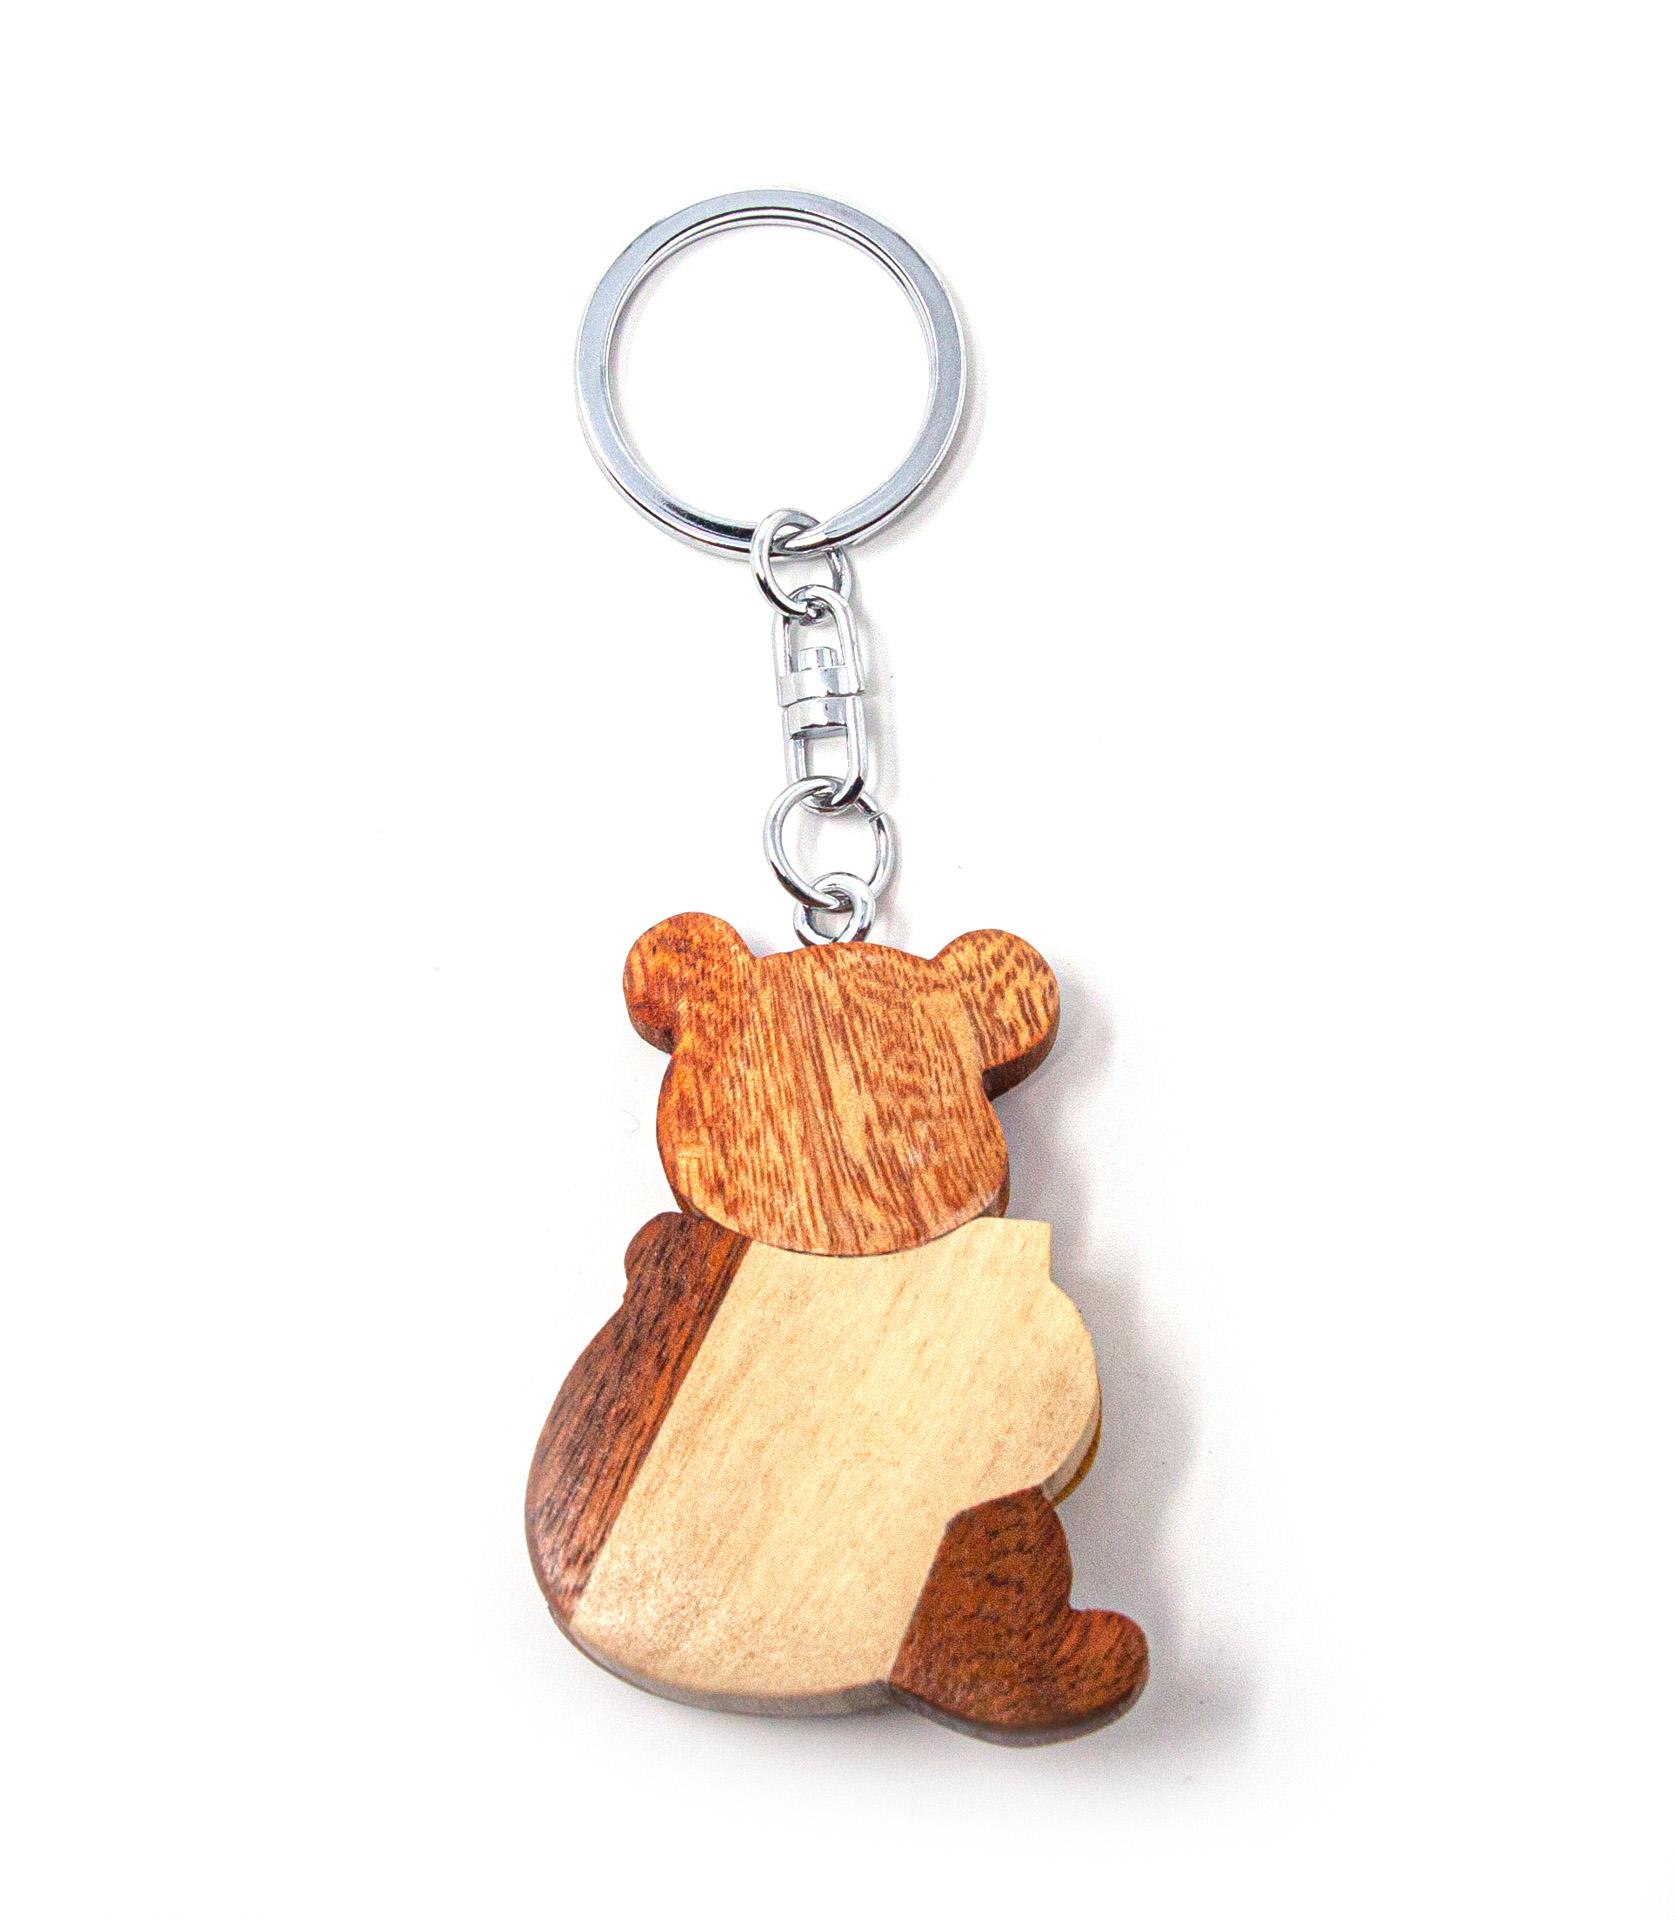 Braunbär Schlüsselanhänger aus Holz